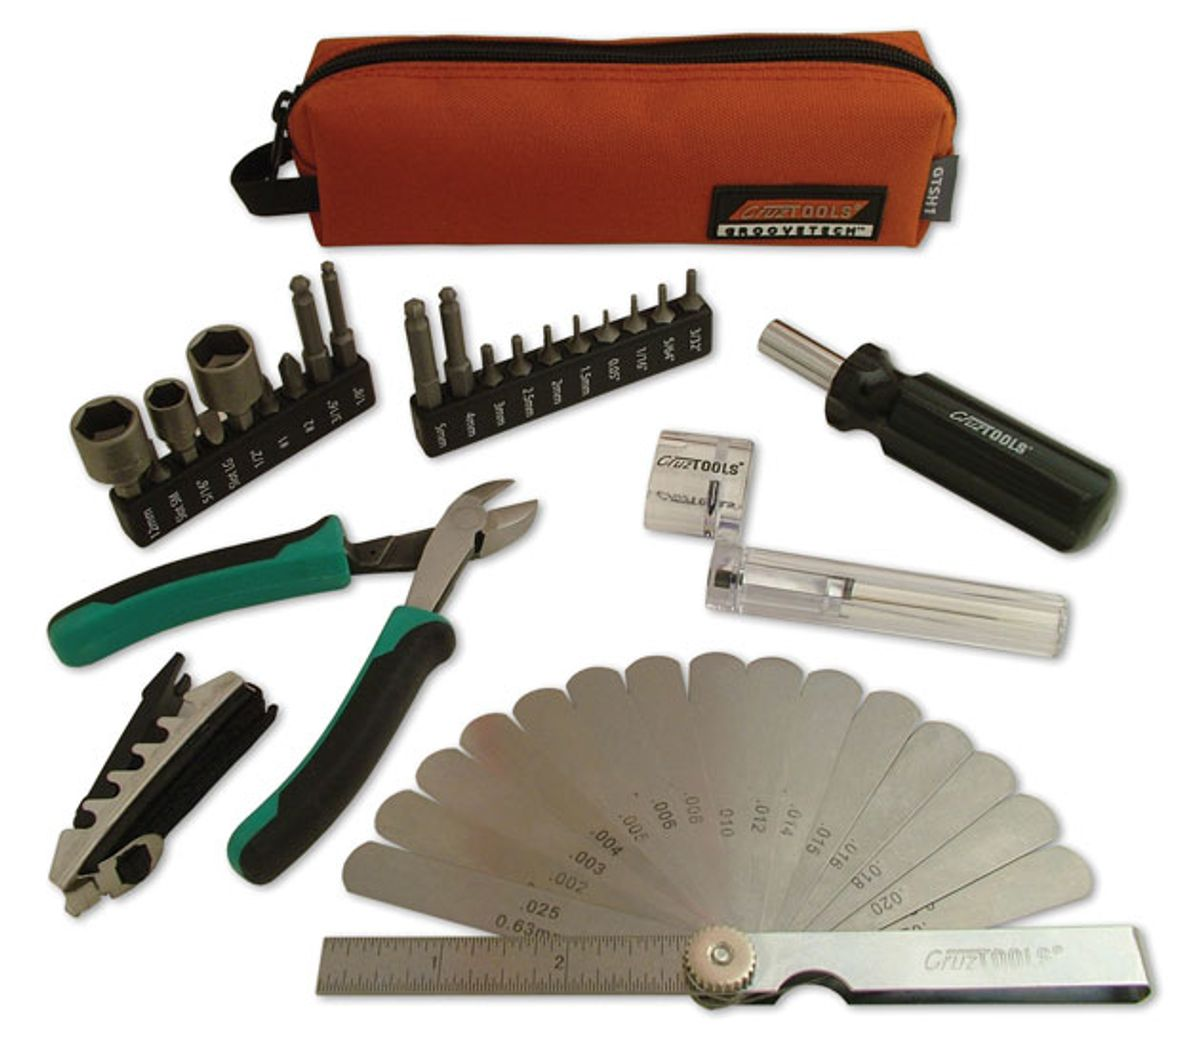 CruzTOOLS Announces Stagehand Tool Kit